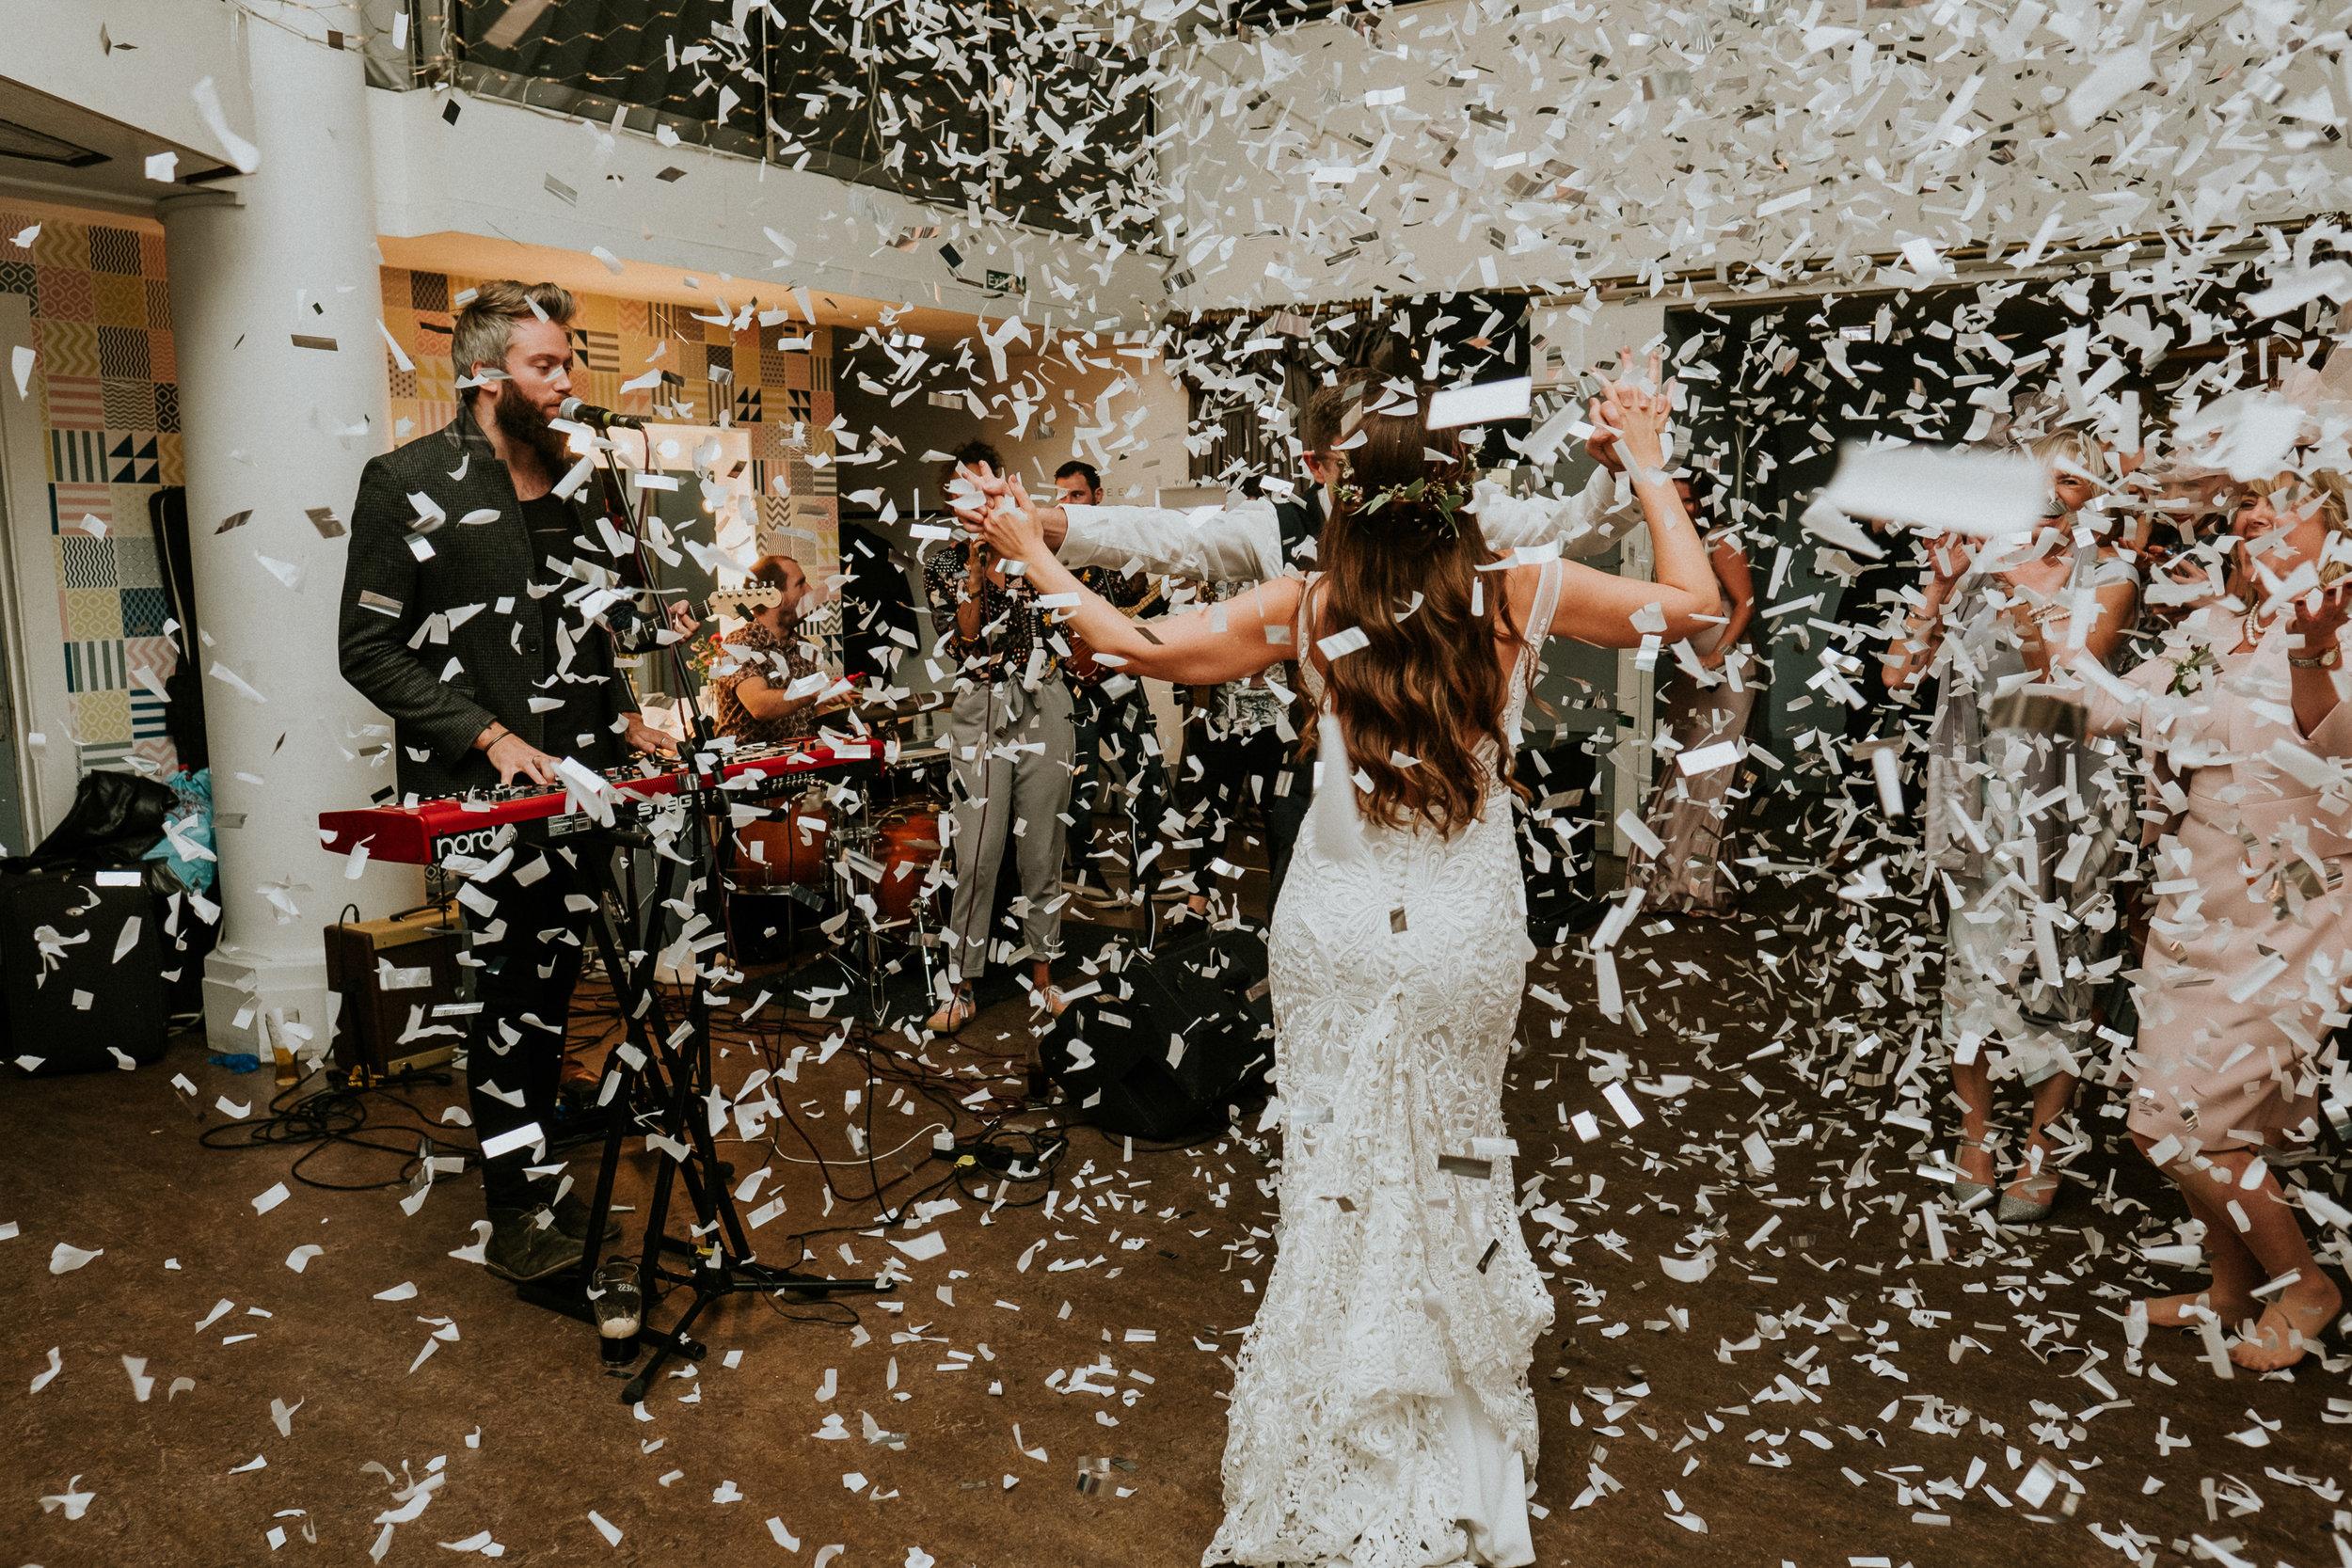 44 Oh Me Oh My Liverpool Cool Fun Creative Wedding Photographer Joanna Nicole Photography4.jpg